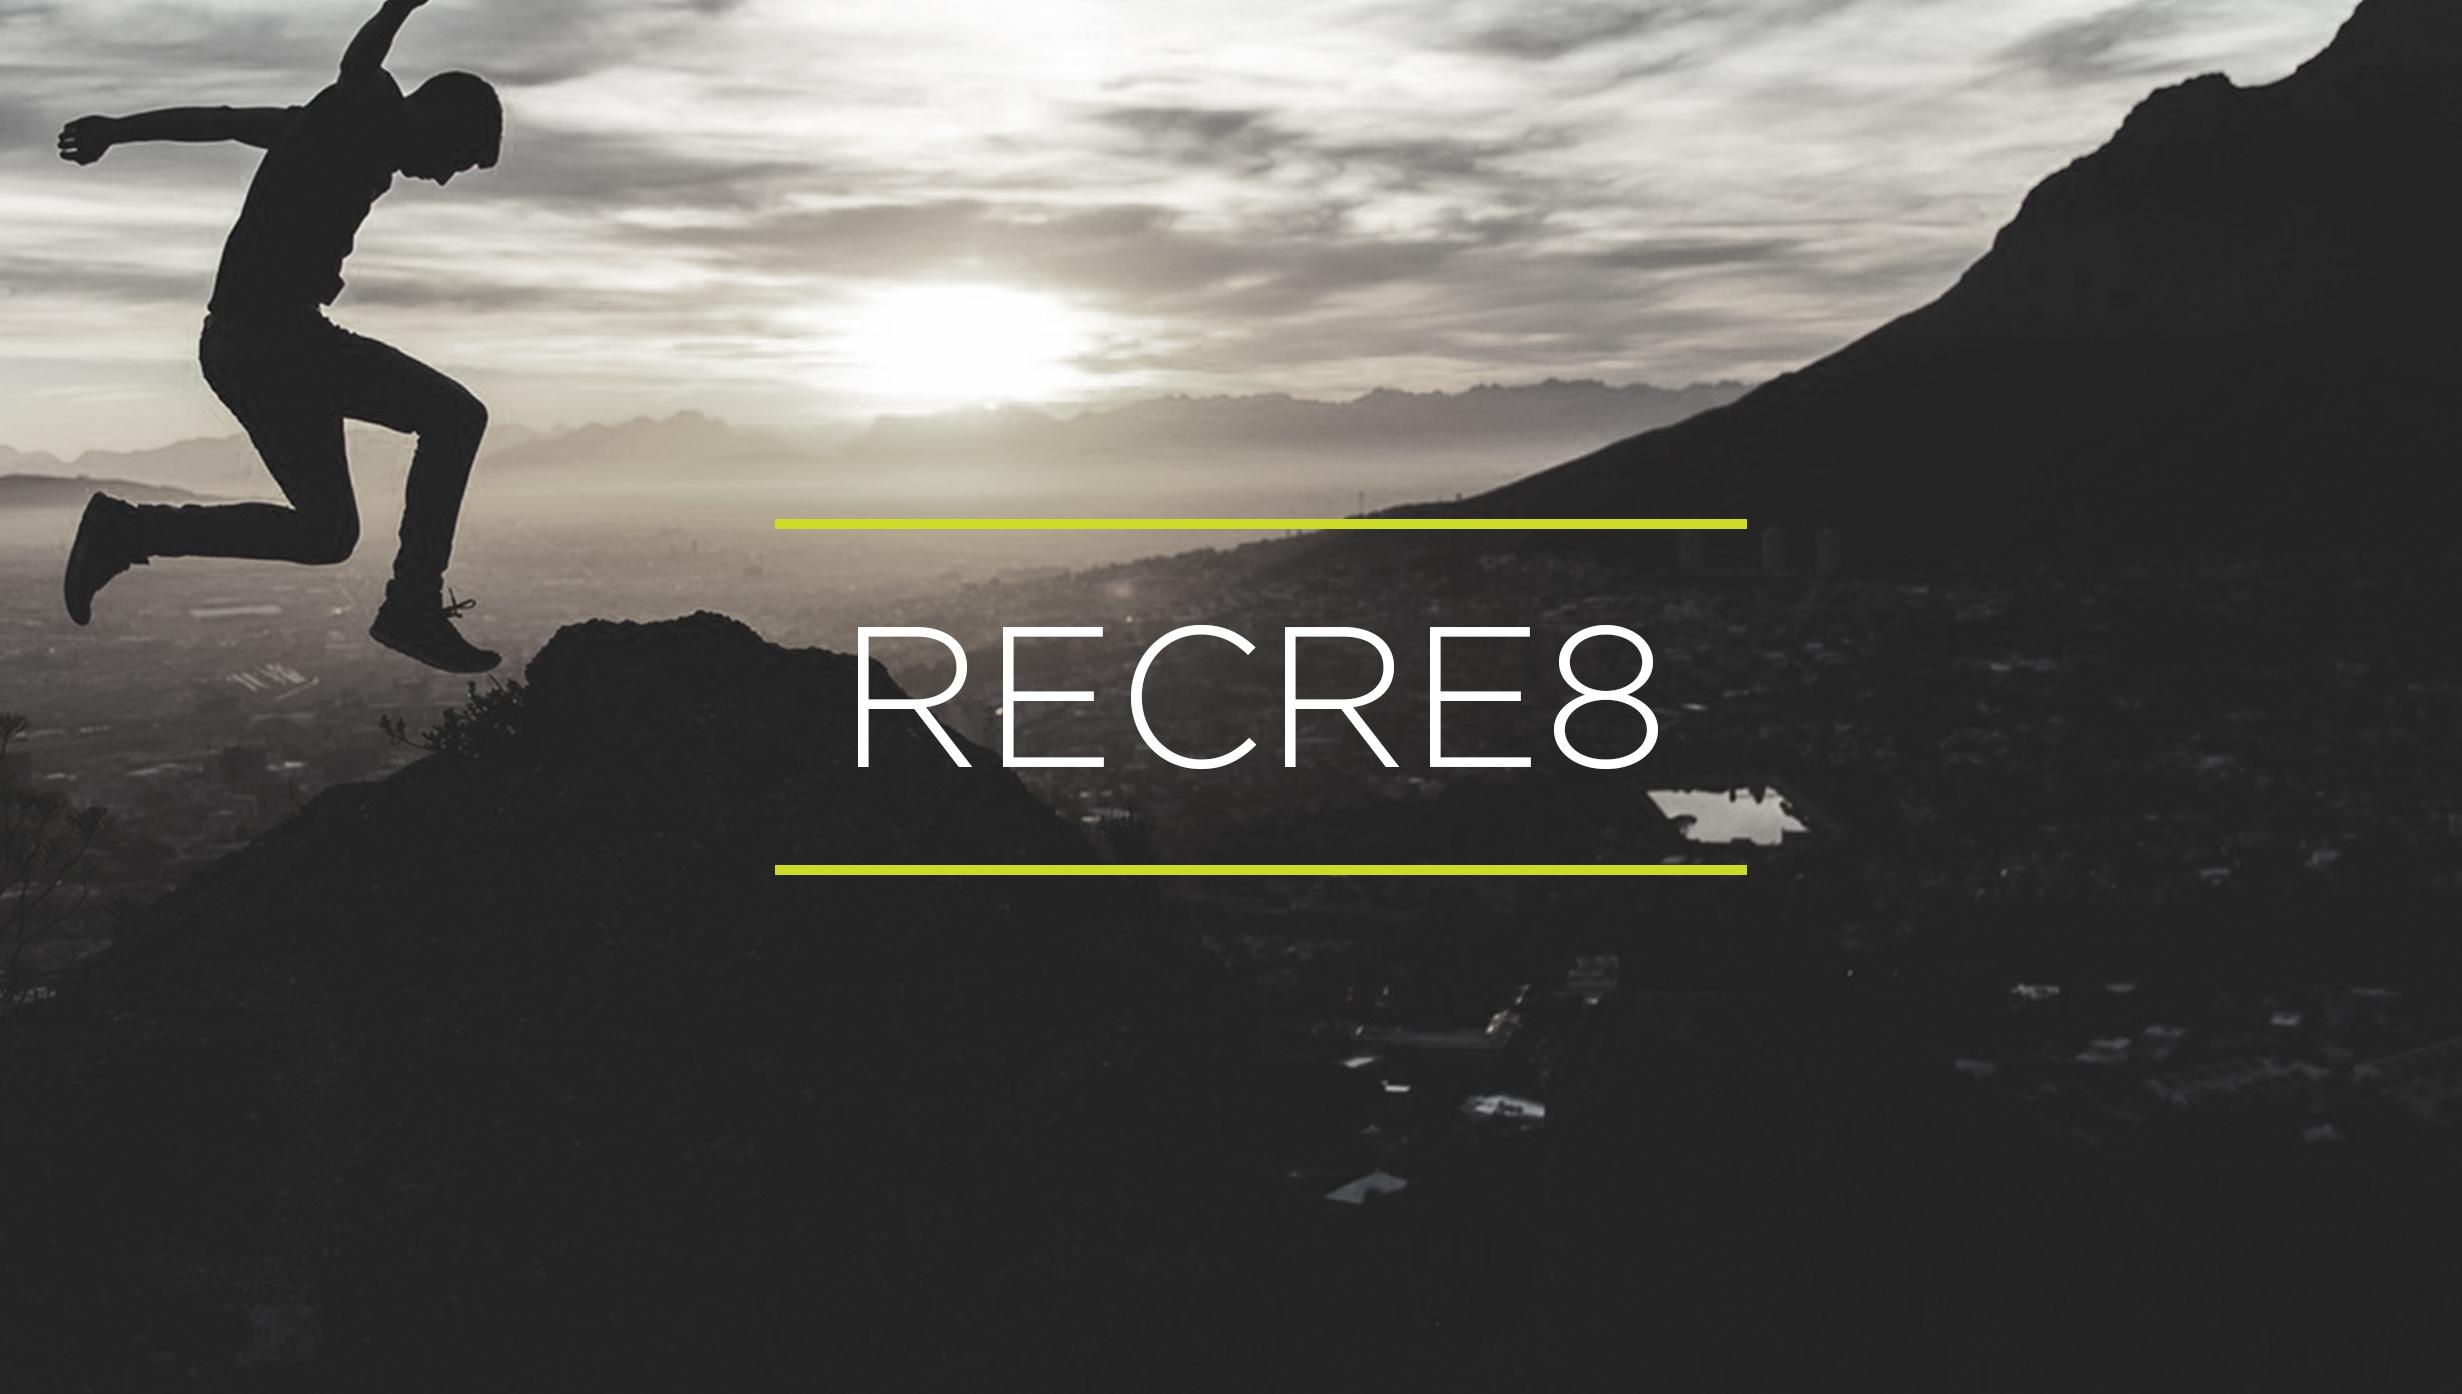 cre8life-recre8-1.jpg